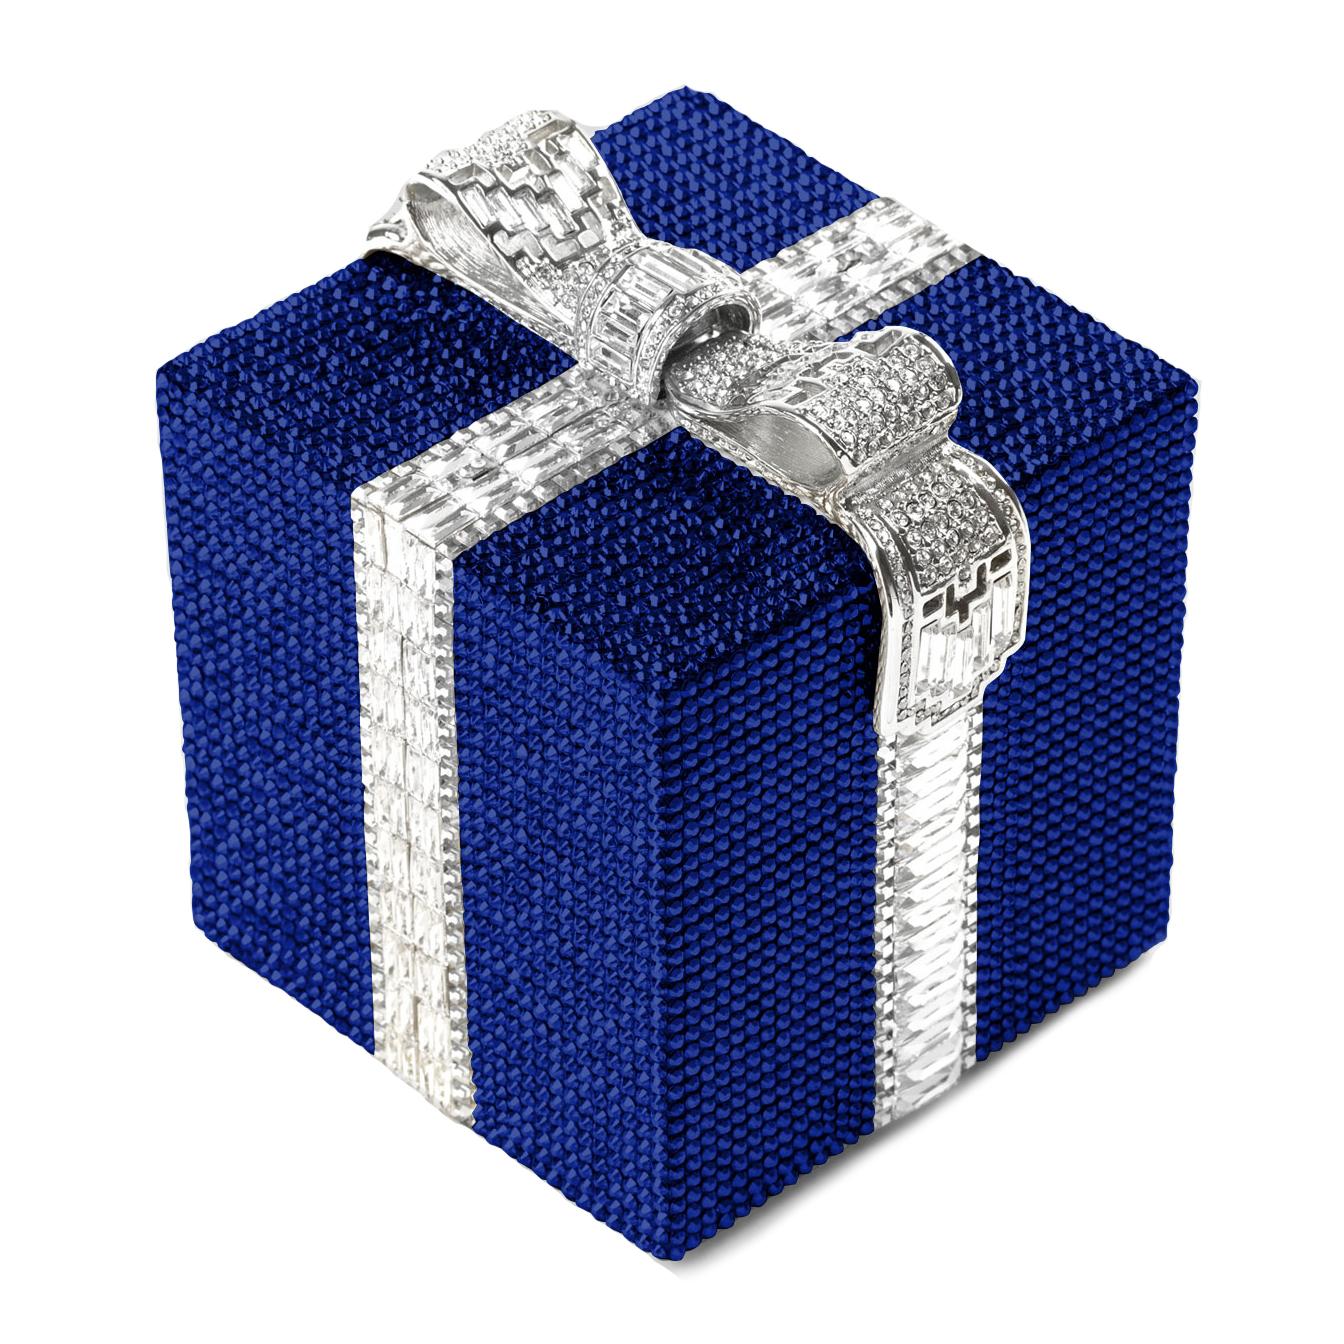 judith-leiber-crystal-cube-gift-clutch-bag-product-1-6037892-103365538.jpeg